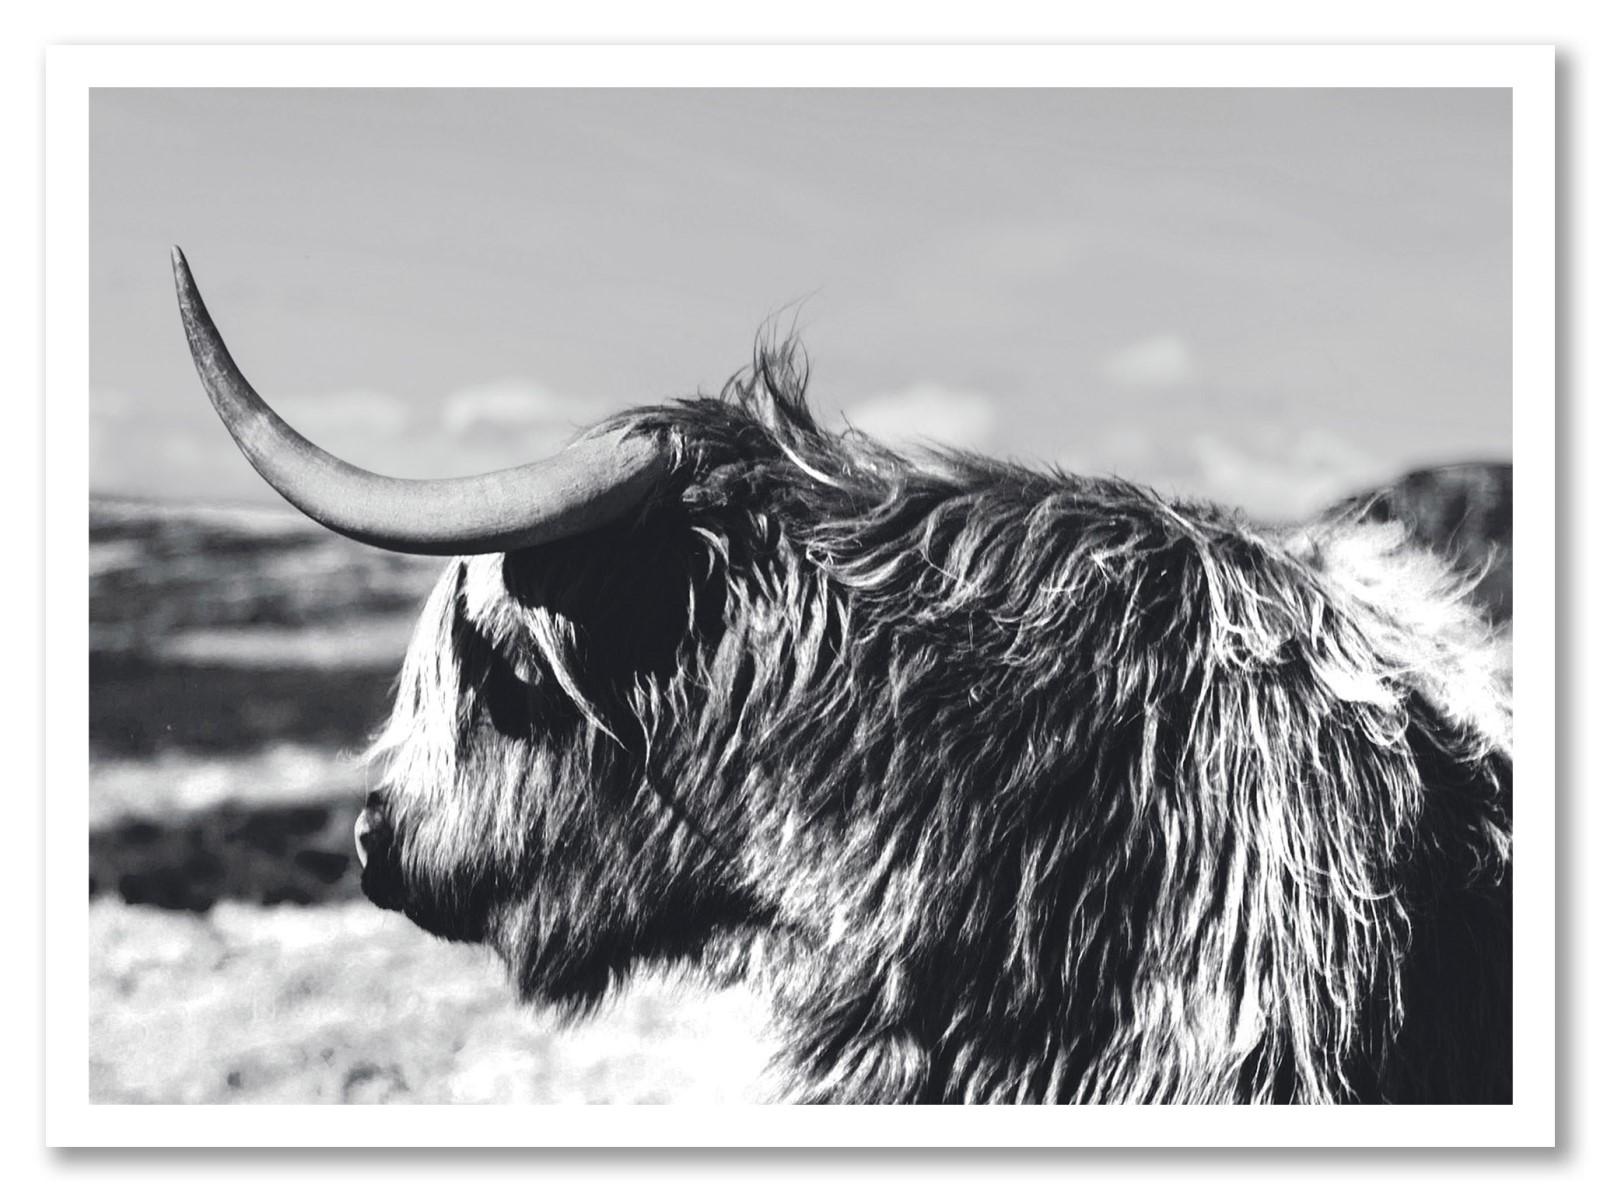 Animaux - Le Yak